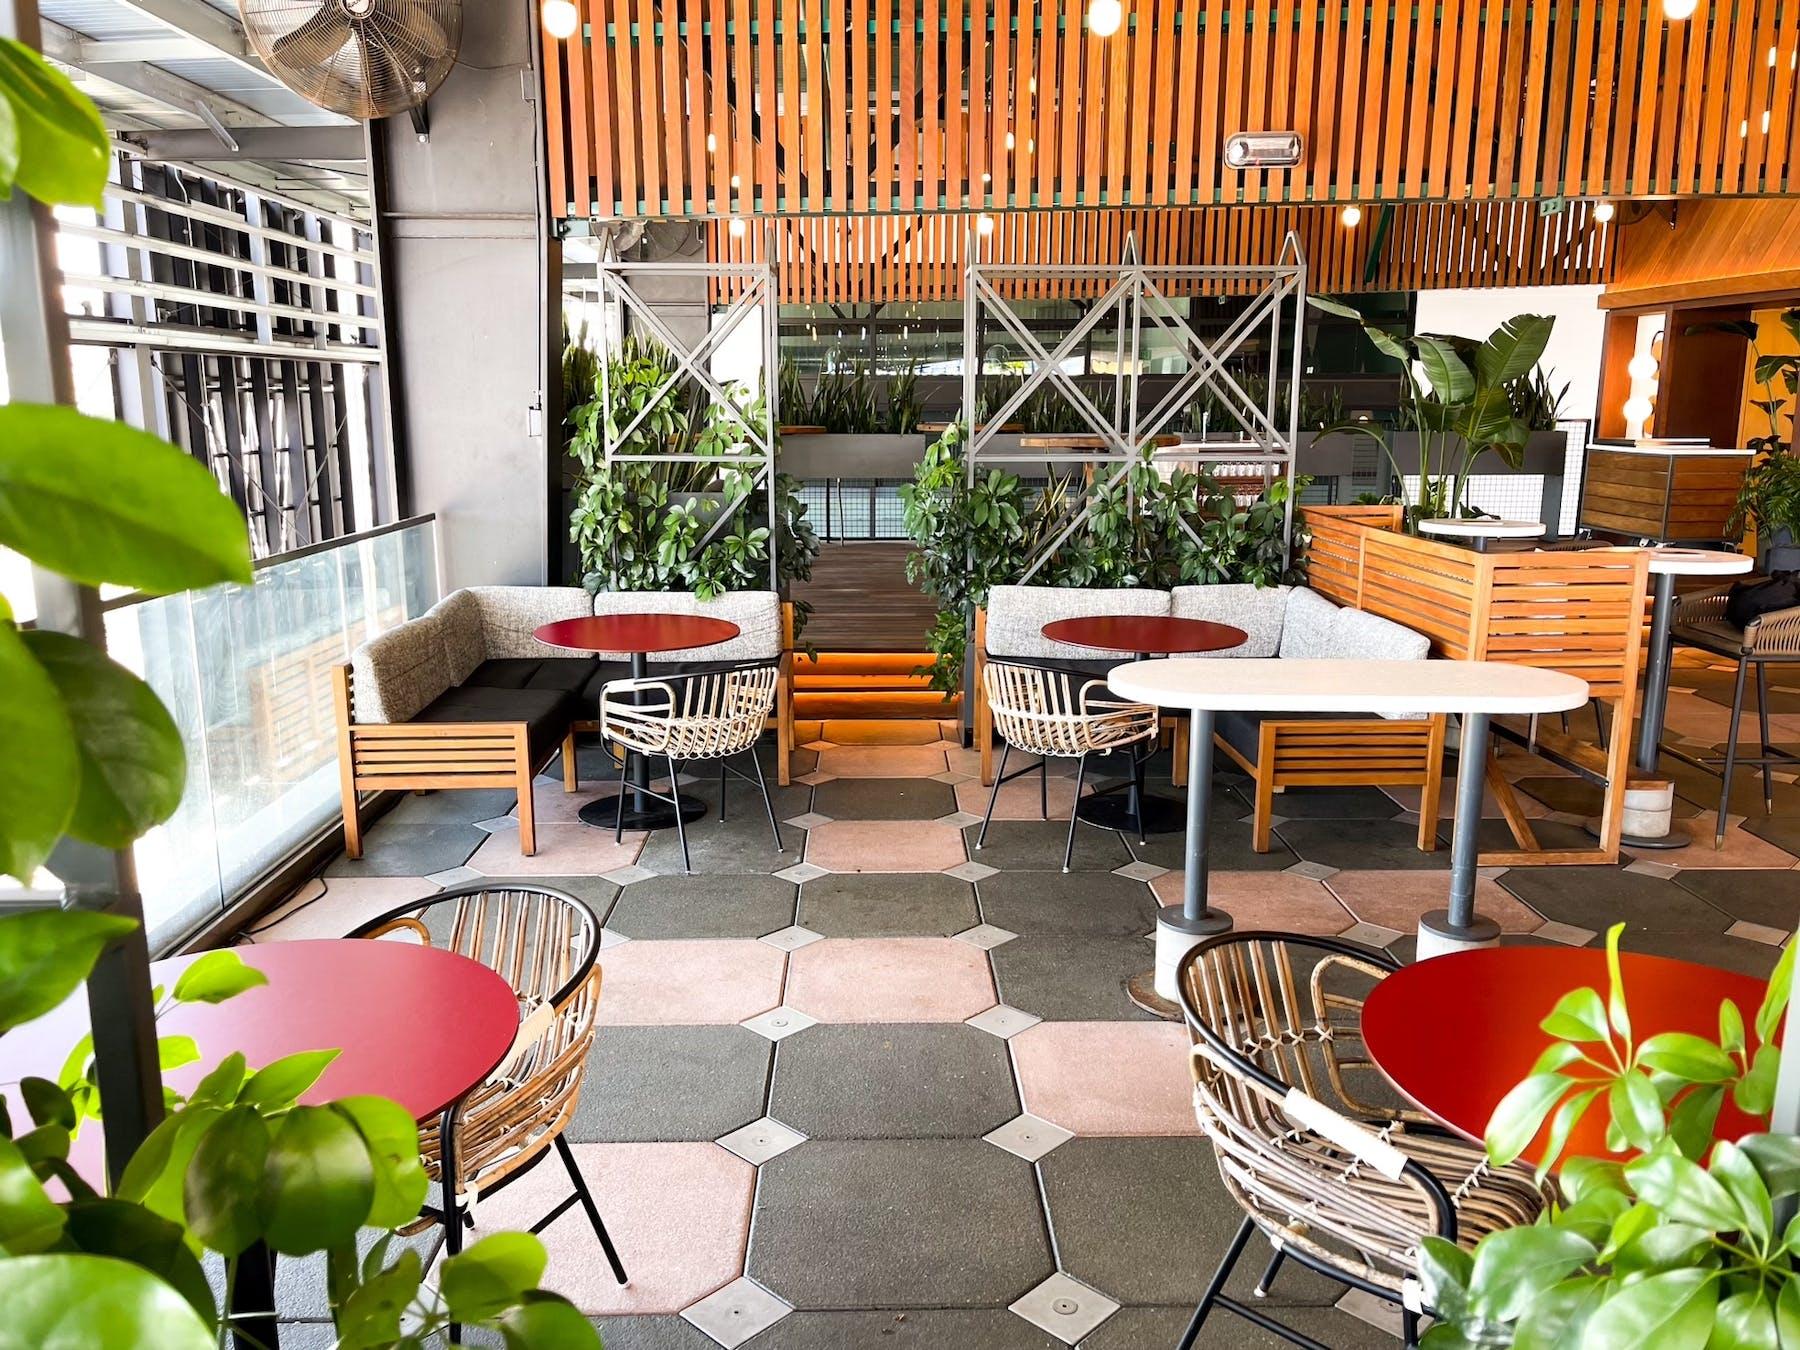 Bauhaus event space